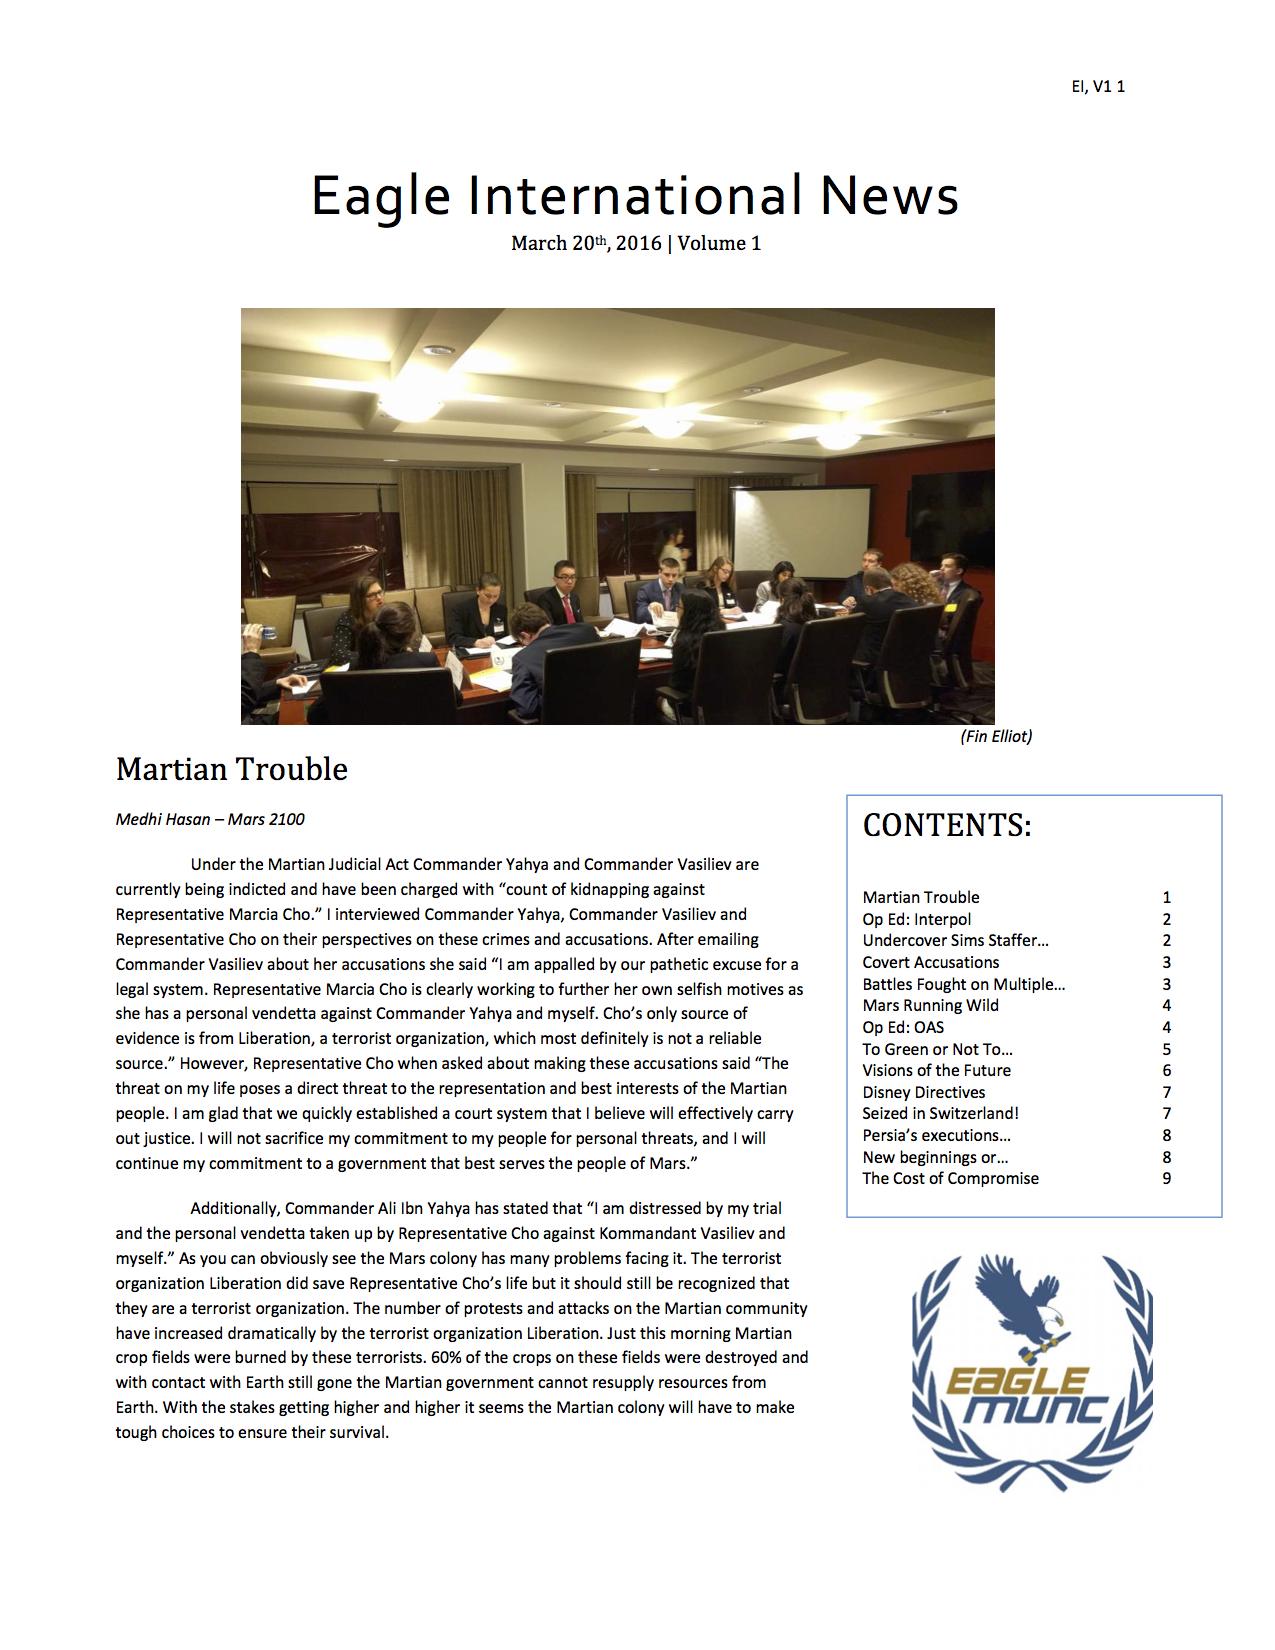 FINALEagle_International_News_(1).jpg